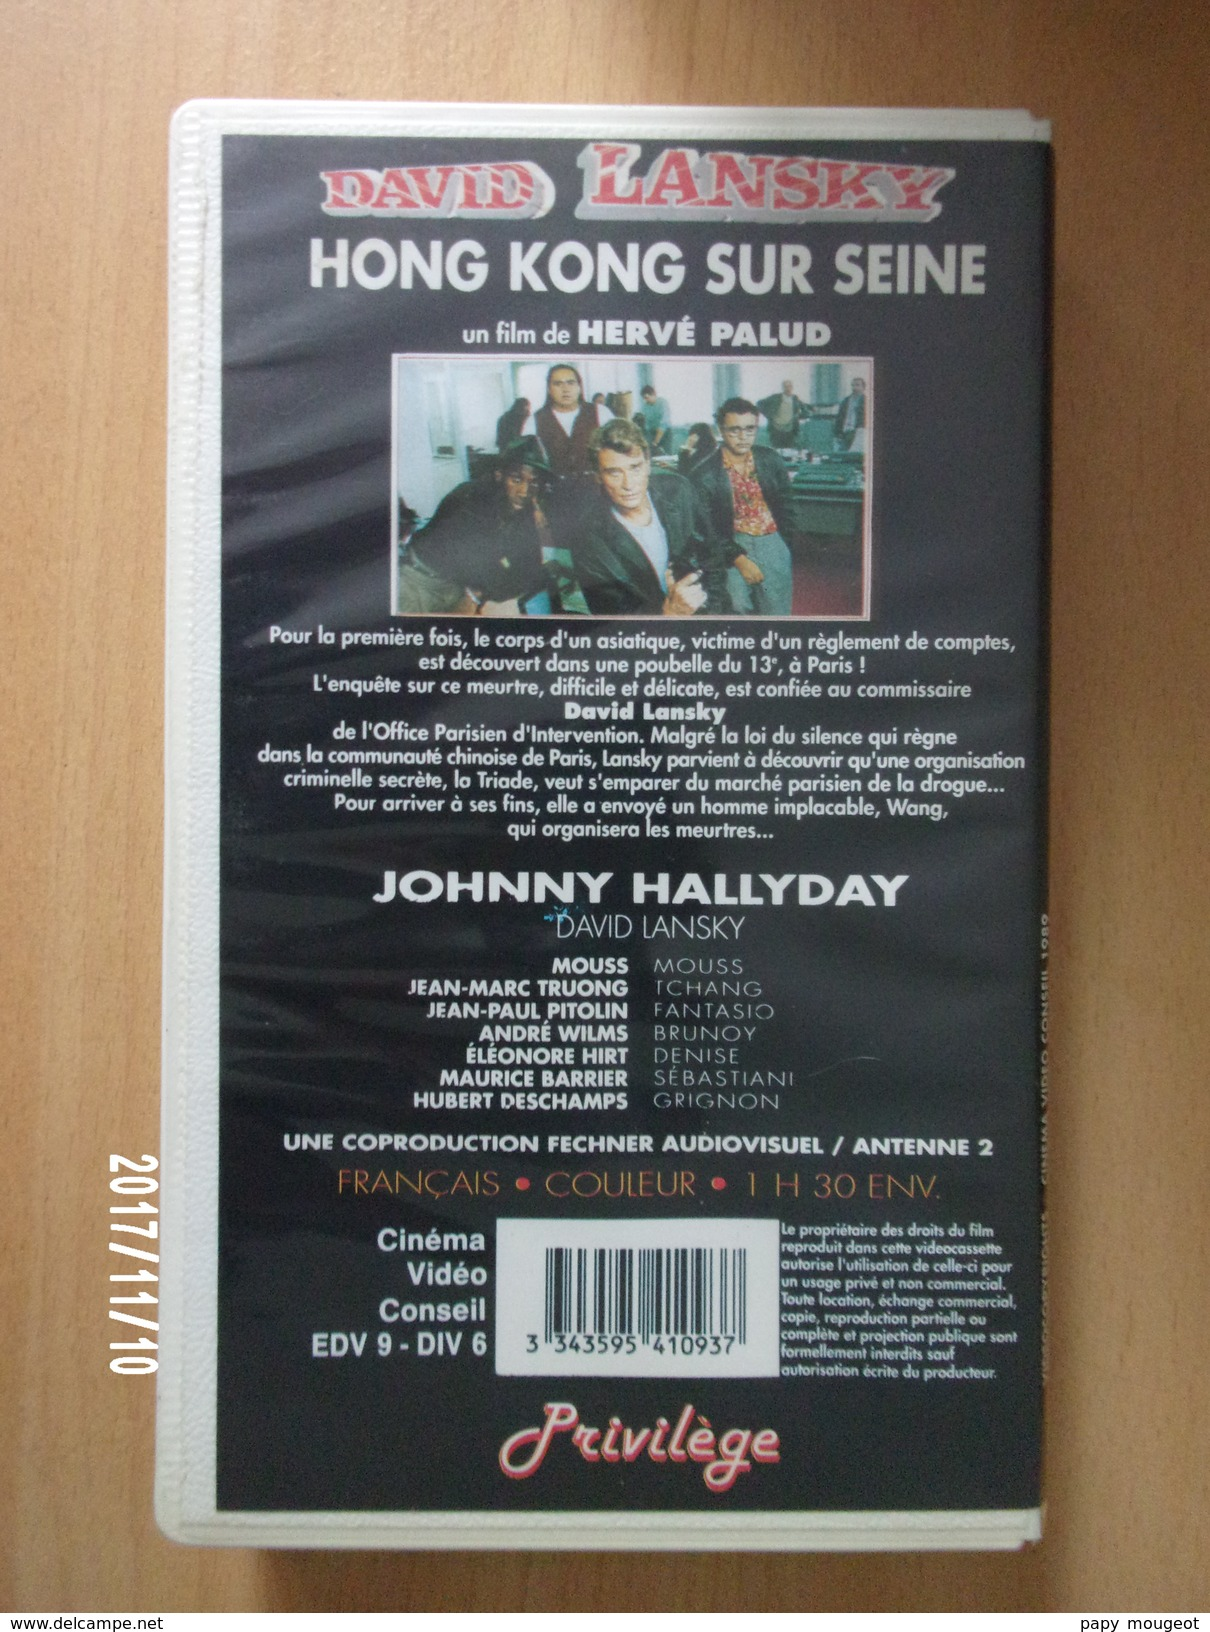 David Lansky Hong Kong Sur Seine - Comedy